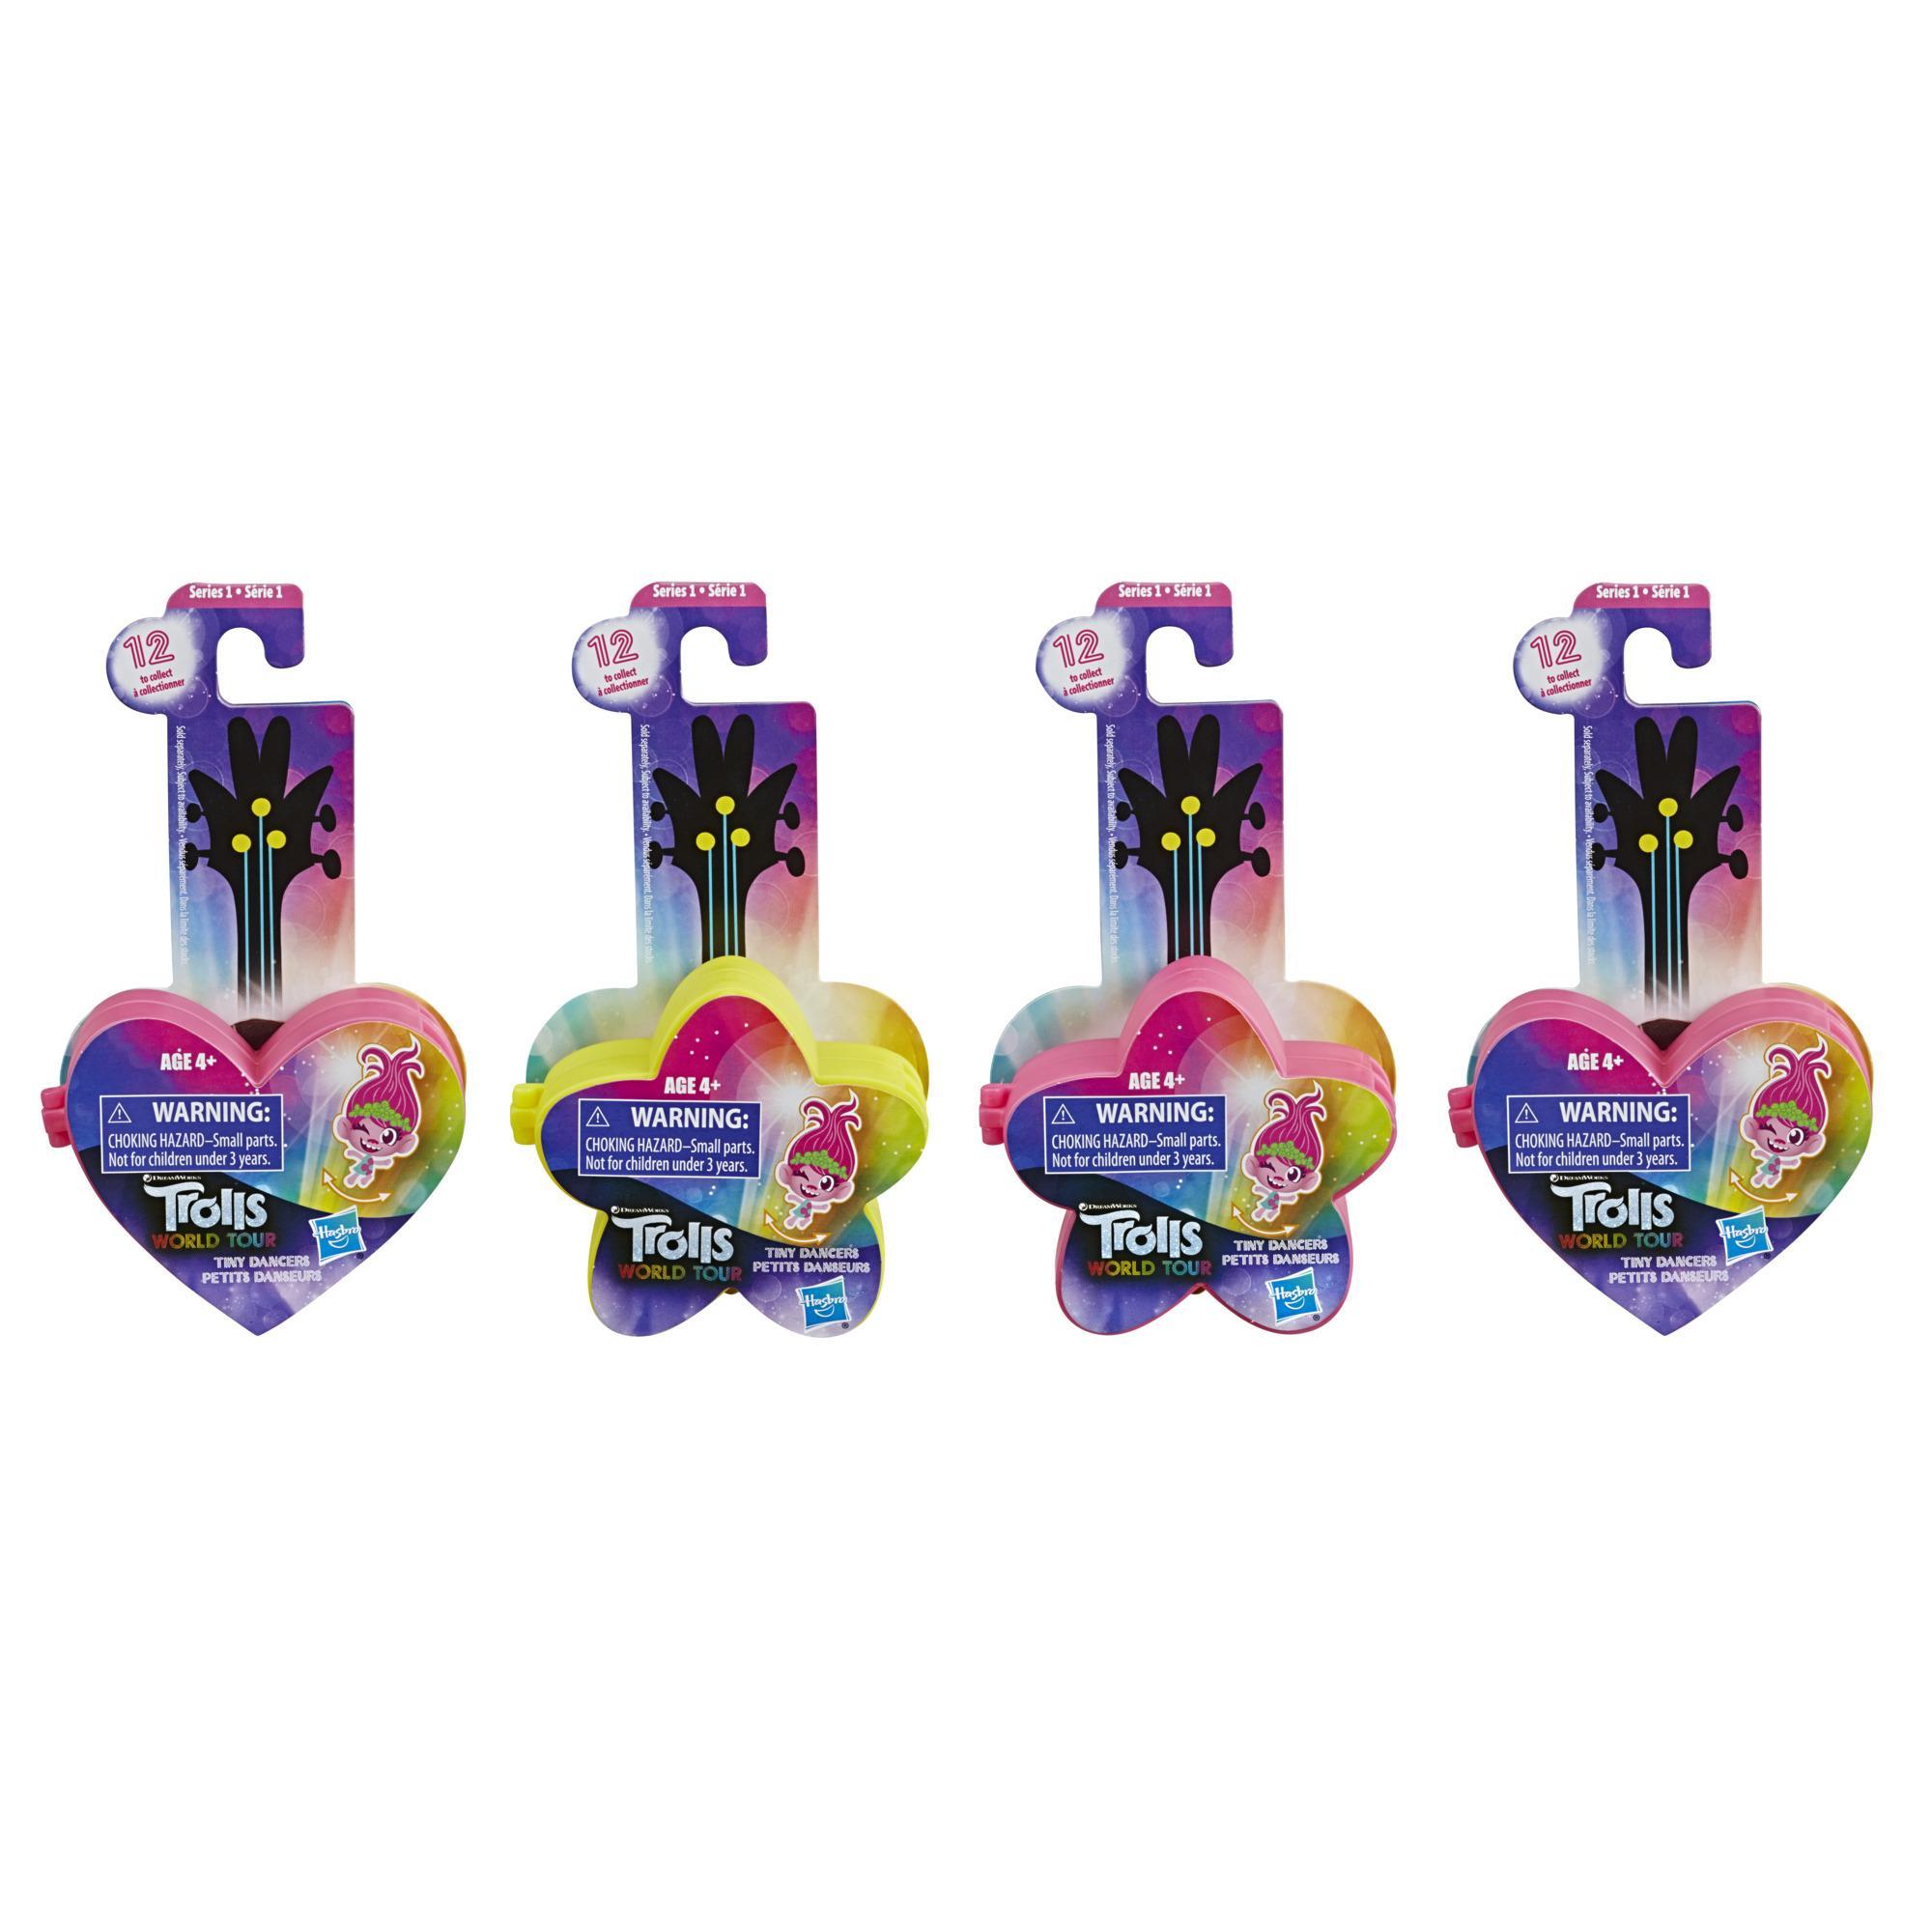 Trolls World Tour de DreamWorks - Set sorpresa de 4 Mini bailarines - Serie 1 - Figuras de Mini bailarines - Edad: 4 años en adelante